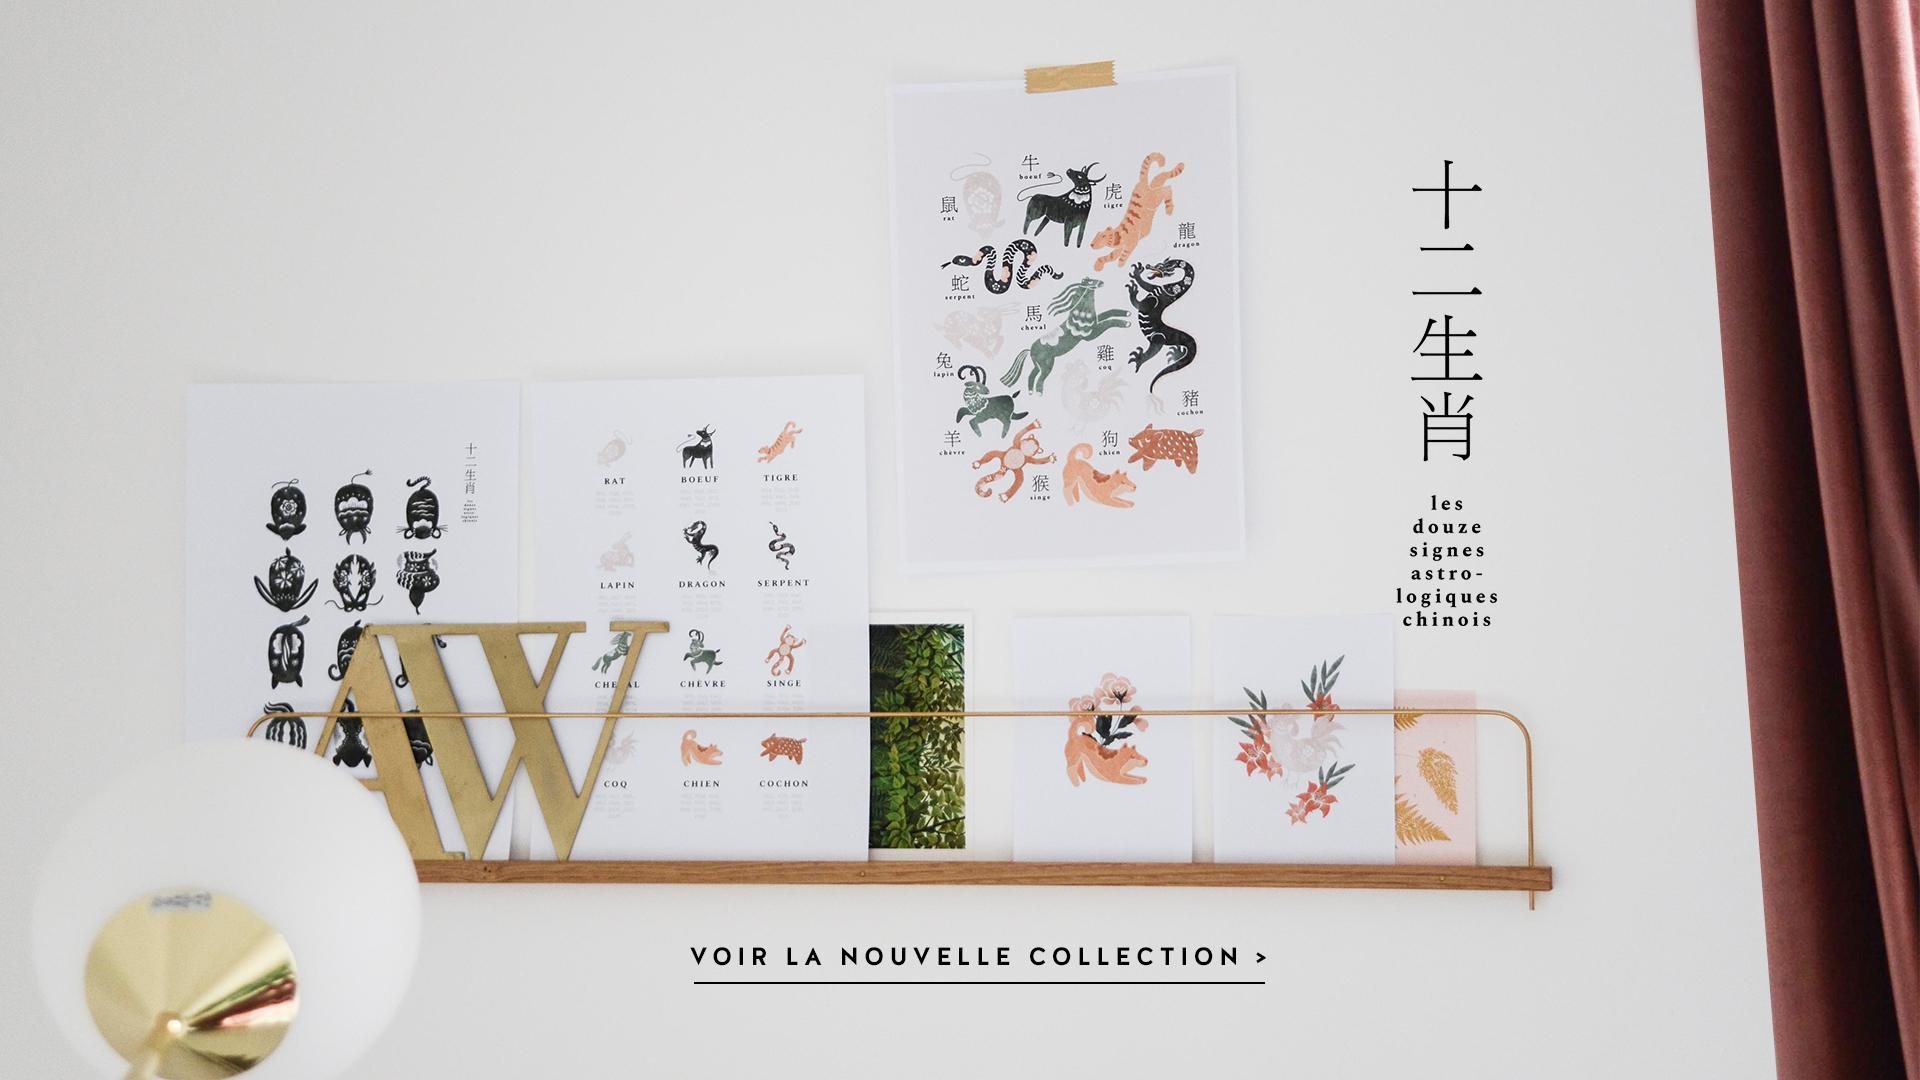 Amelie's workshop